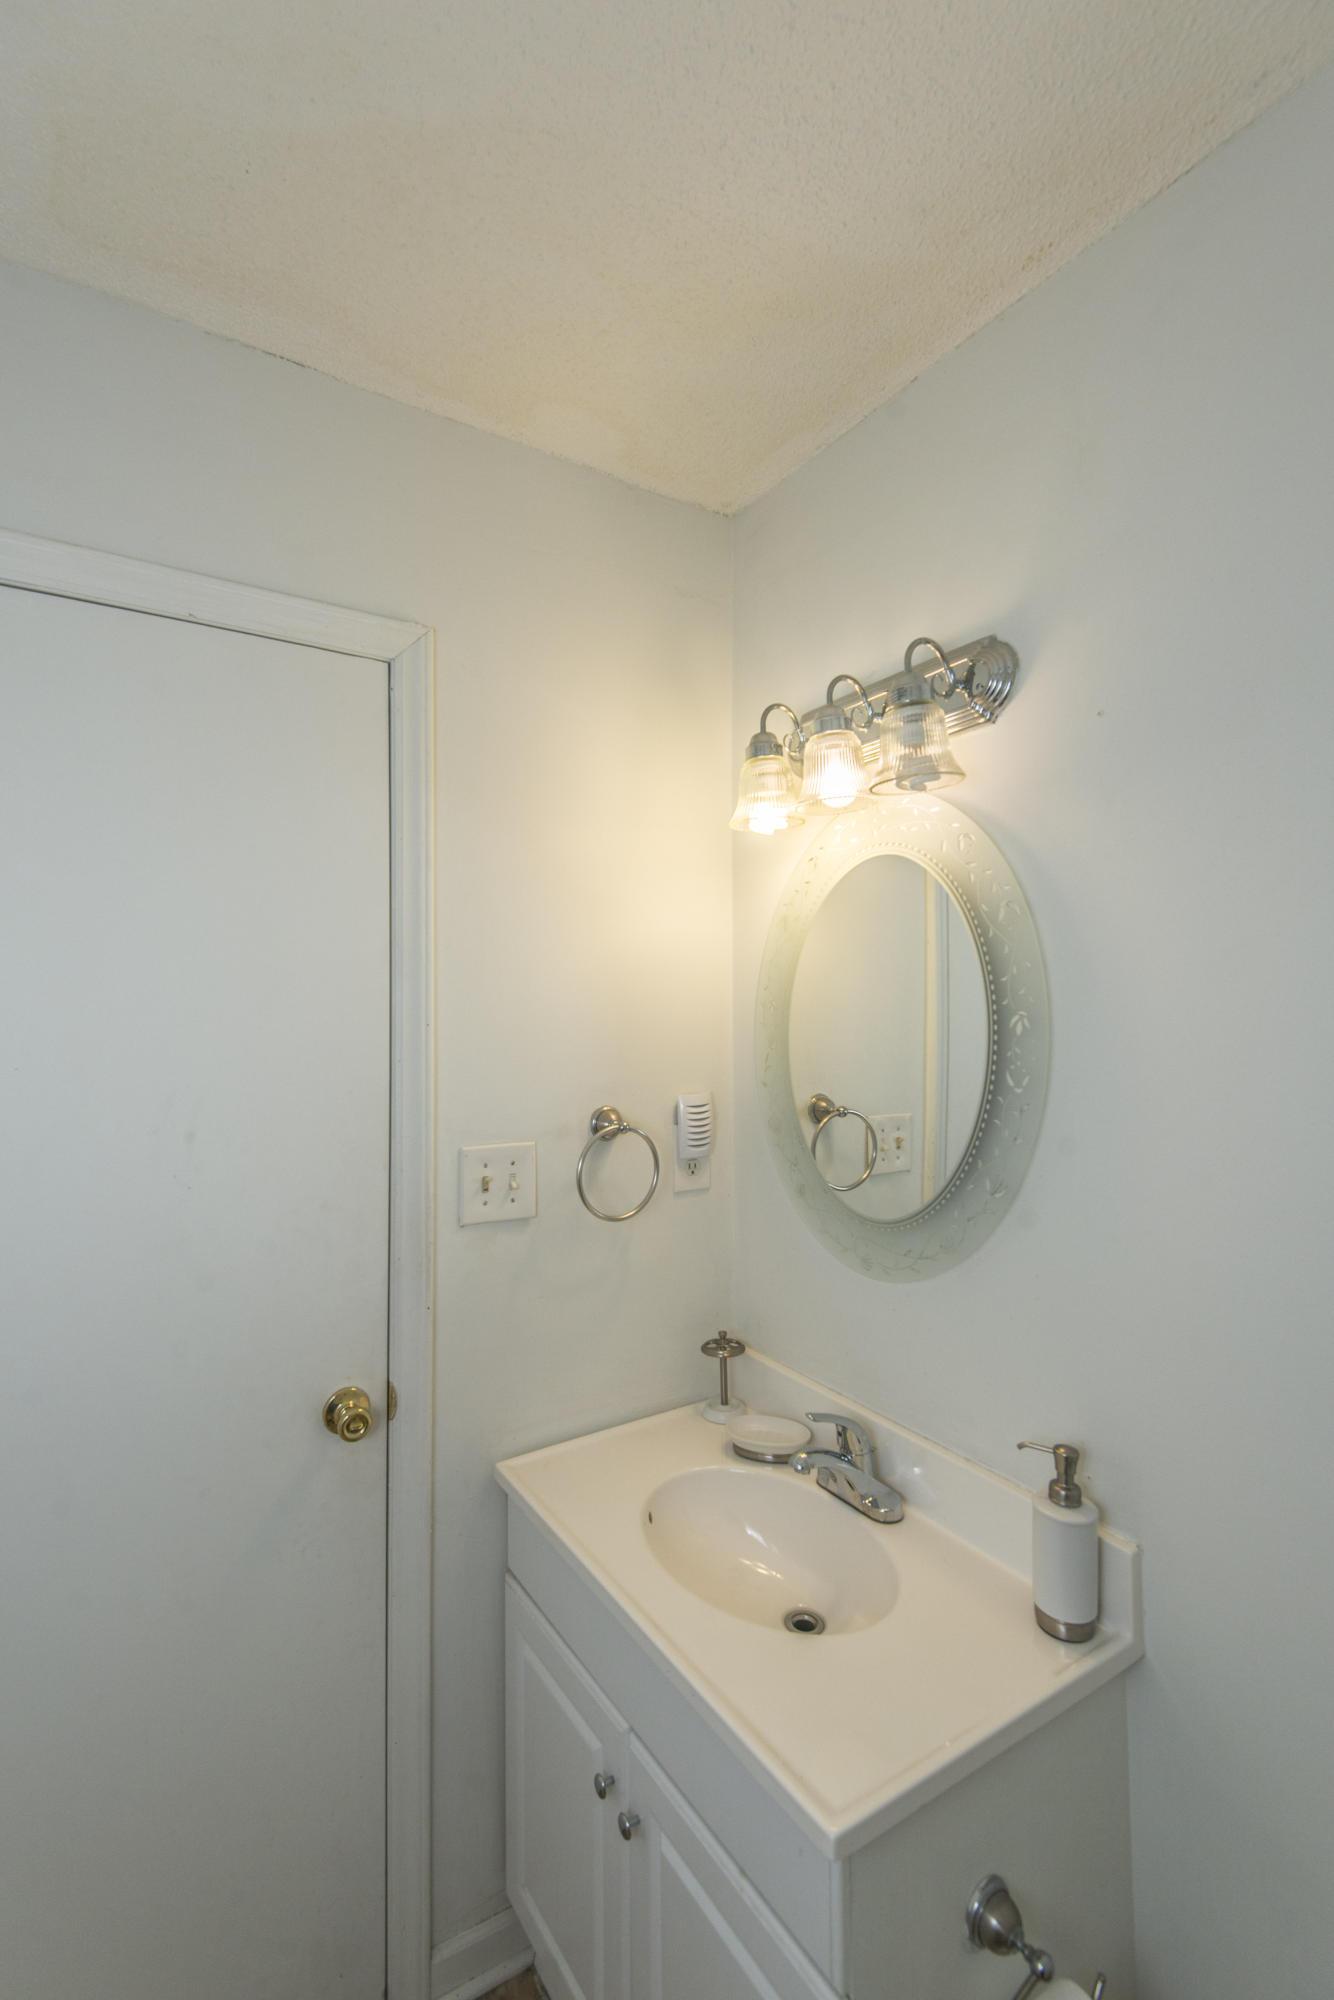 Conifer Hall Homes For Sale - 1003 Mountain Pine, Moncks Corner, SC - 0